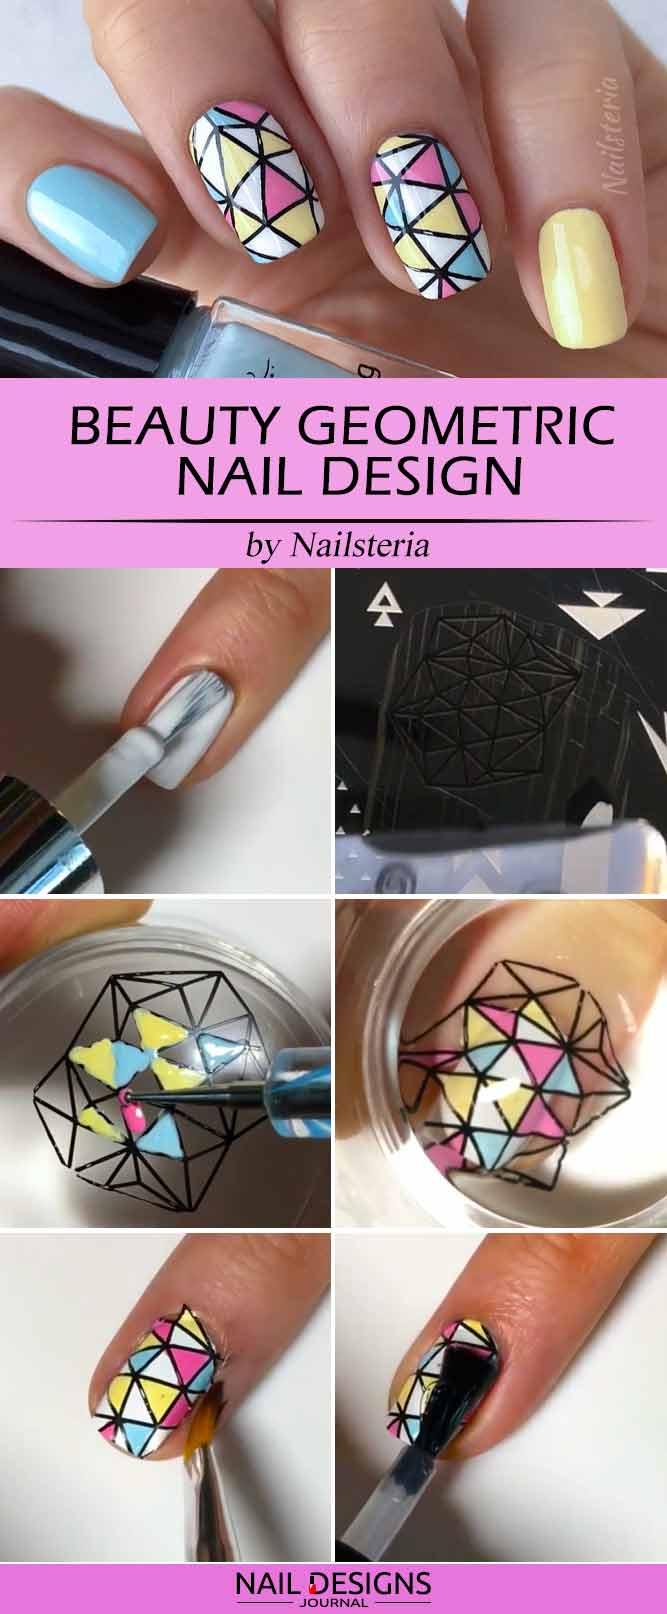 Beauty Geometric Nail Design